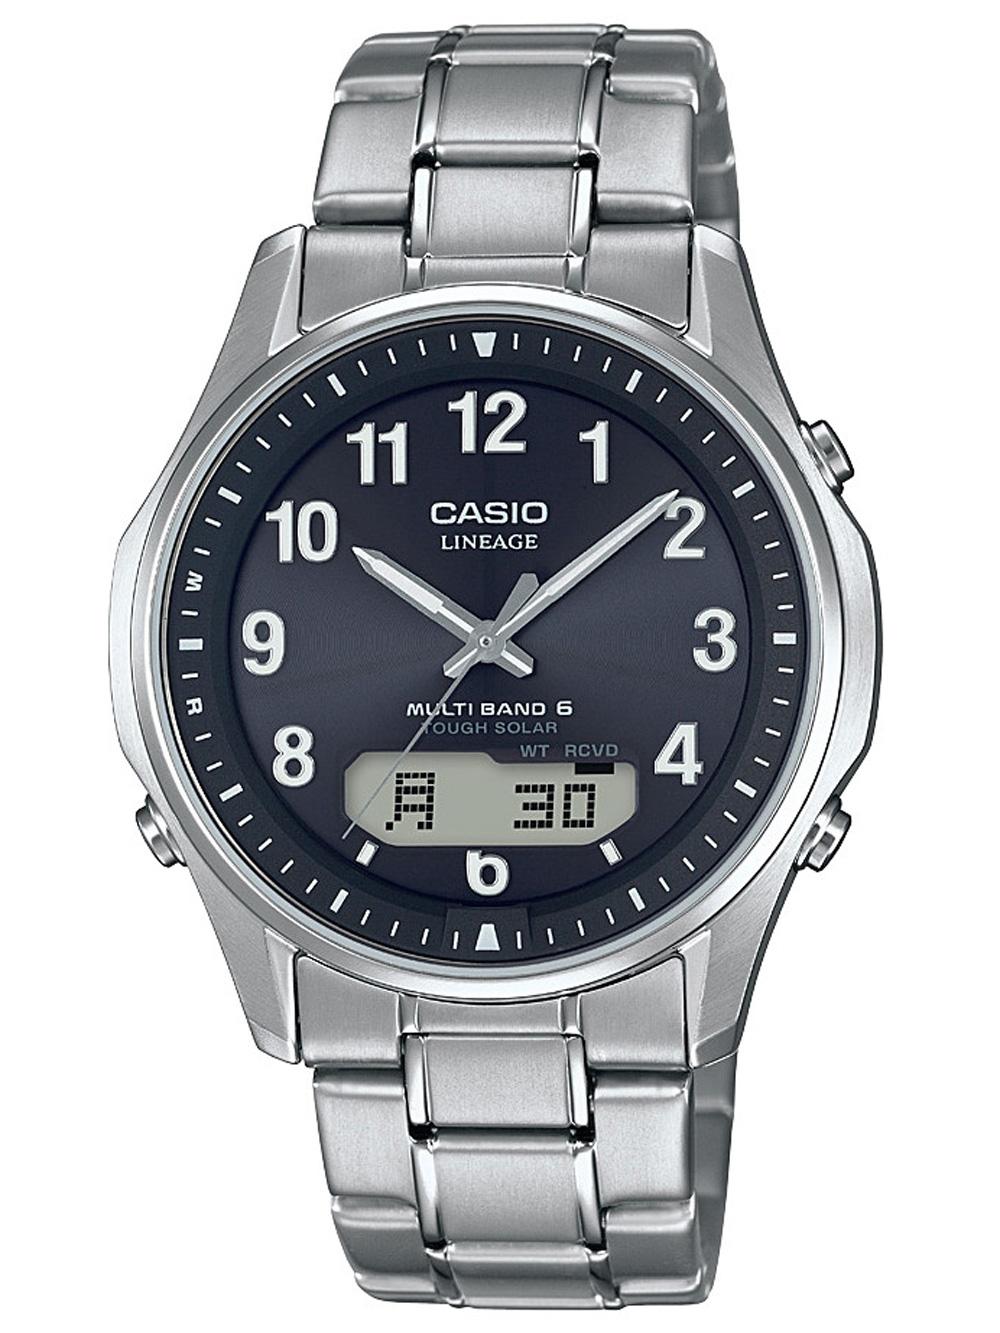 Casio LCW-M100TSE-1A2ER Wave Ceptor 40mm 10ATM